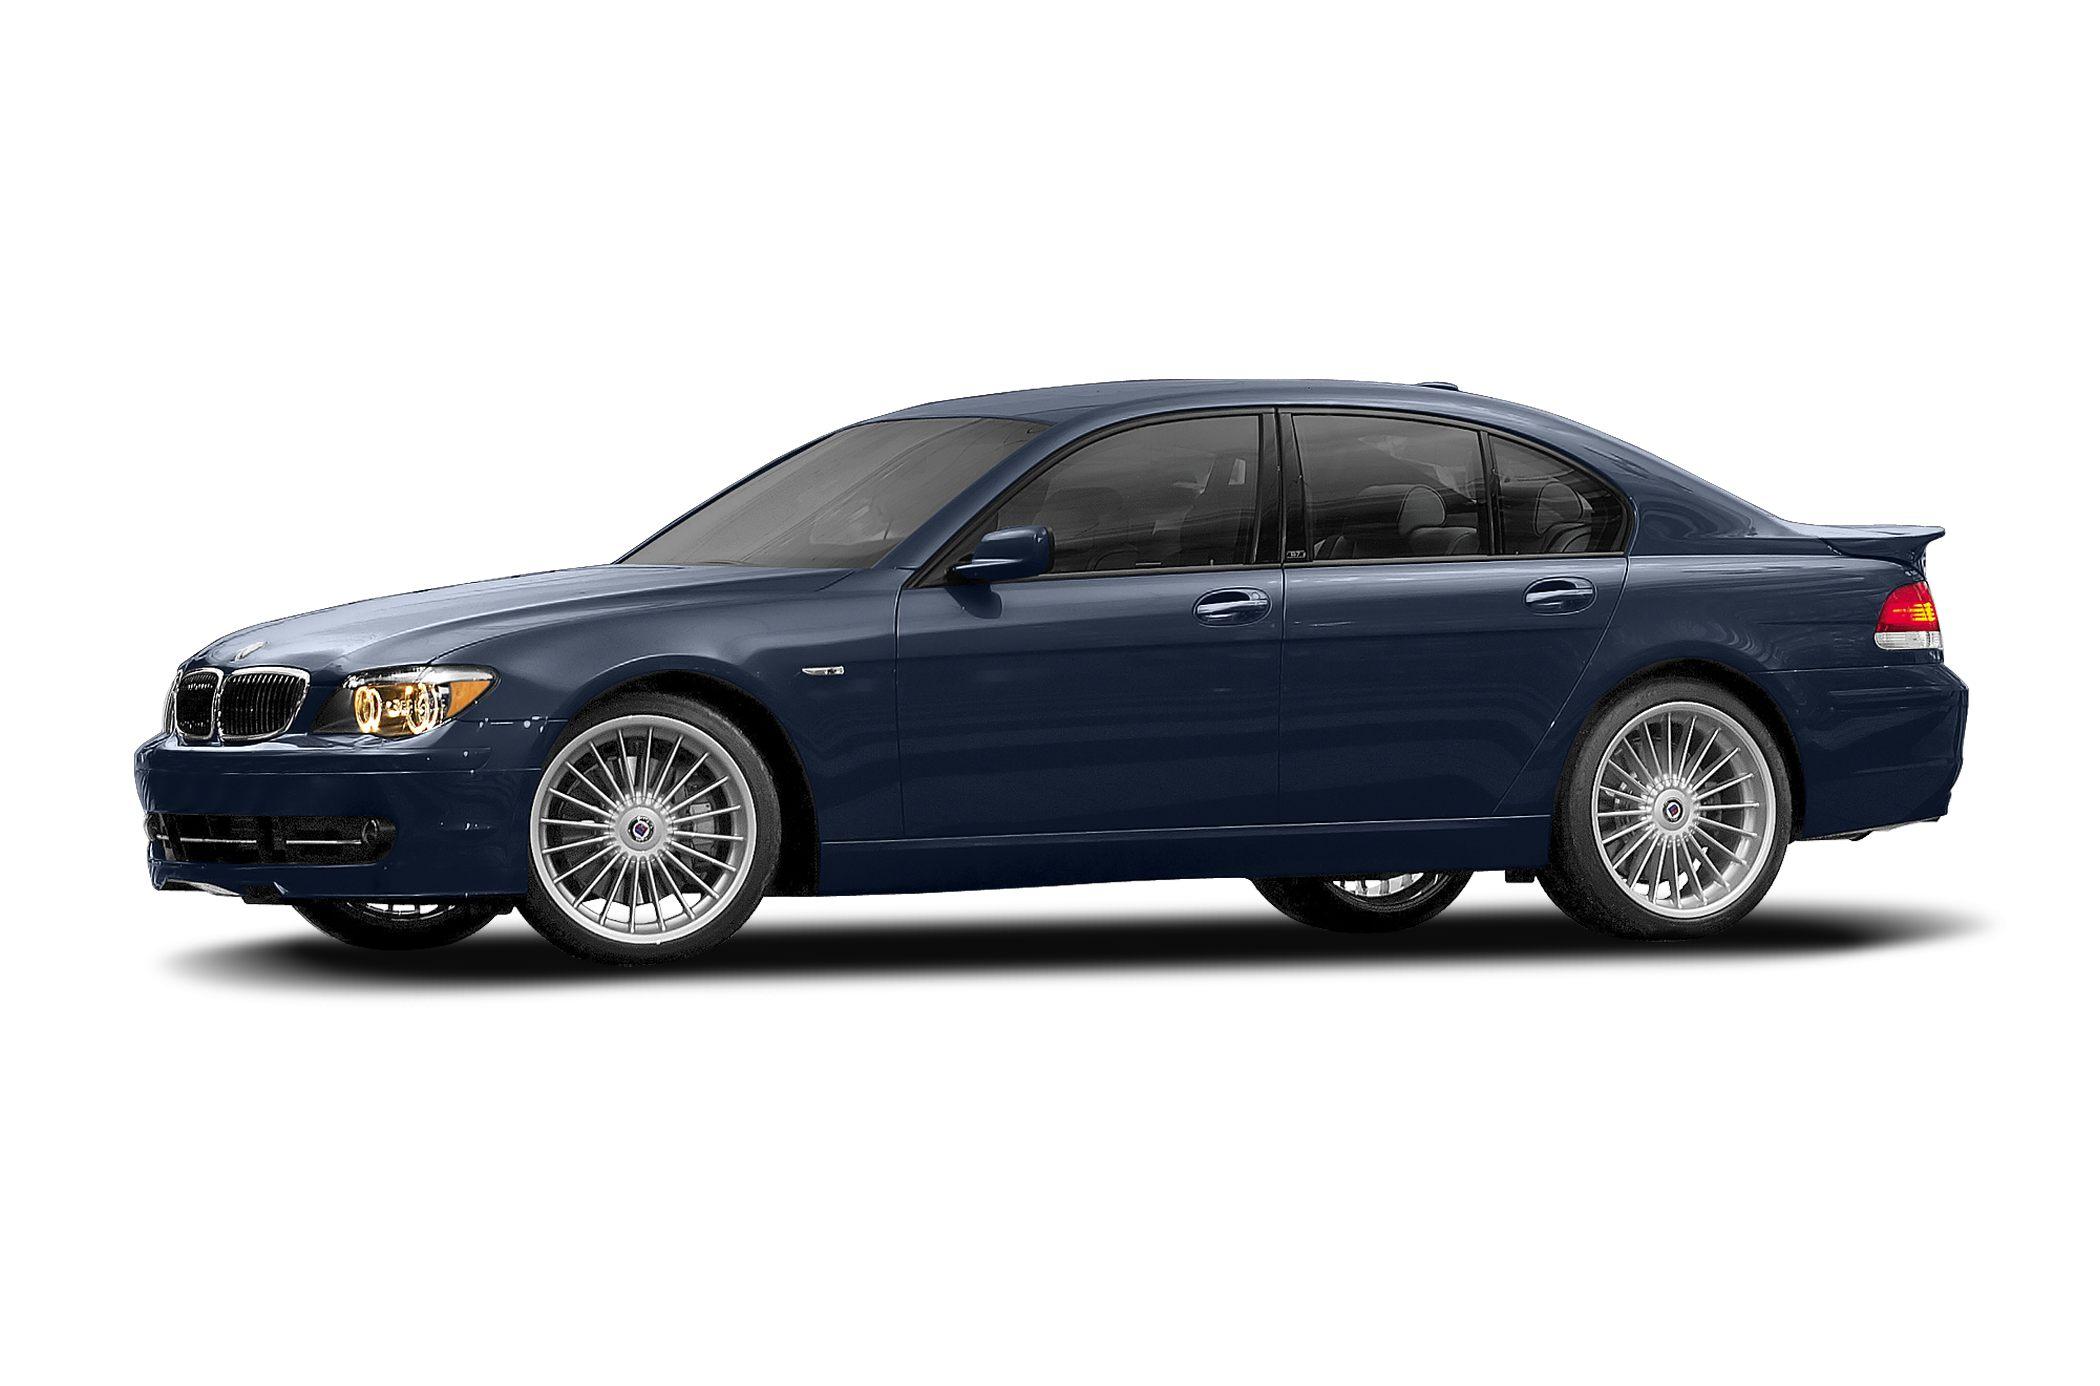 2008 BMW ALPINA B7